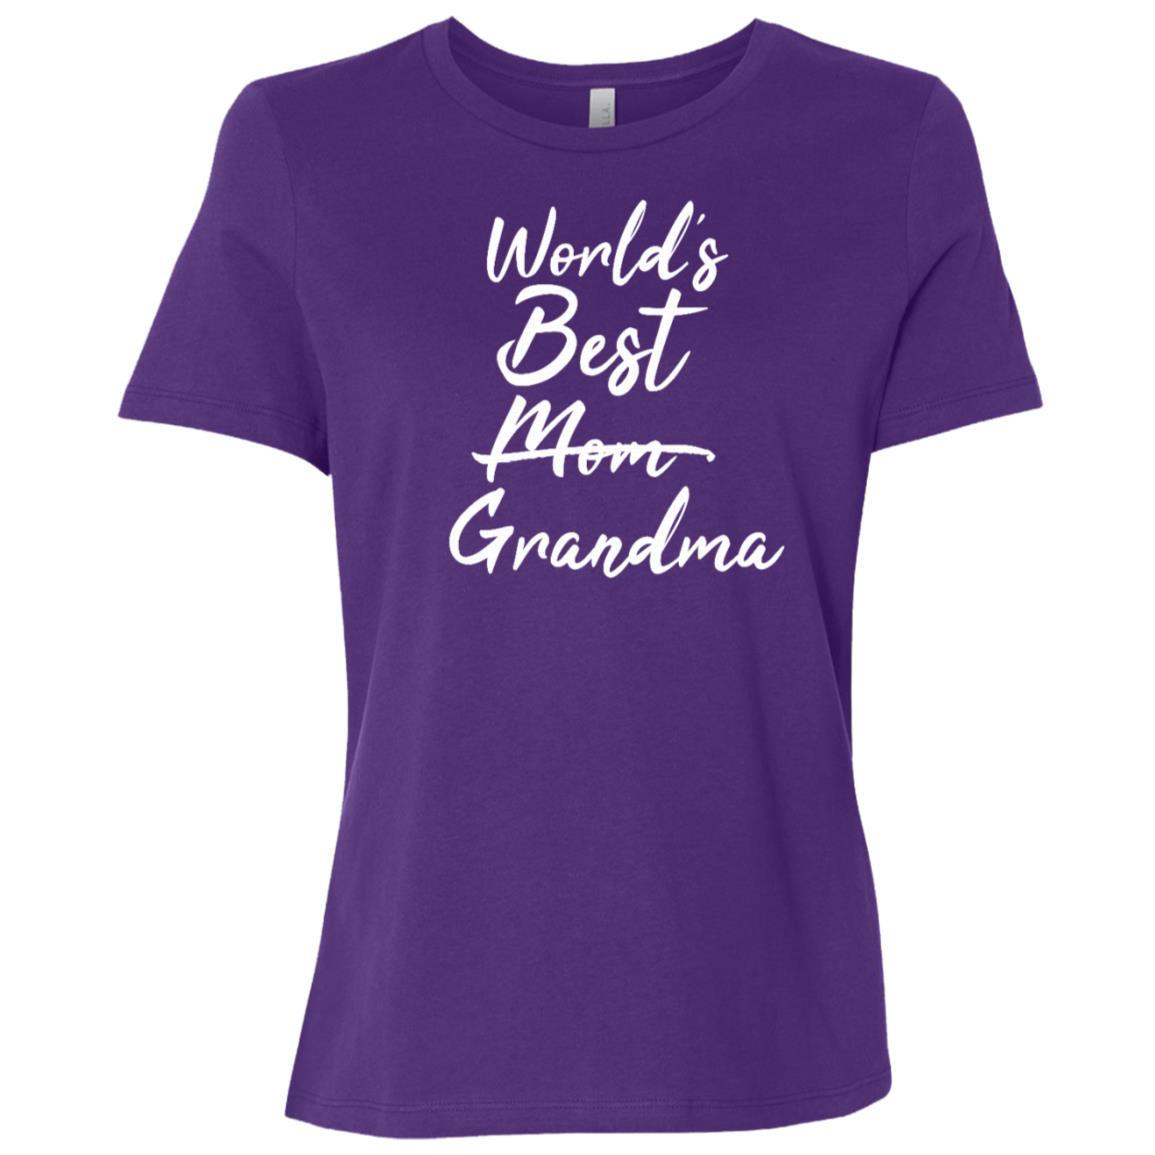 World's Best MomGrandma Promoted Announcement Women Short Sleeve T-Shirt